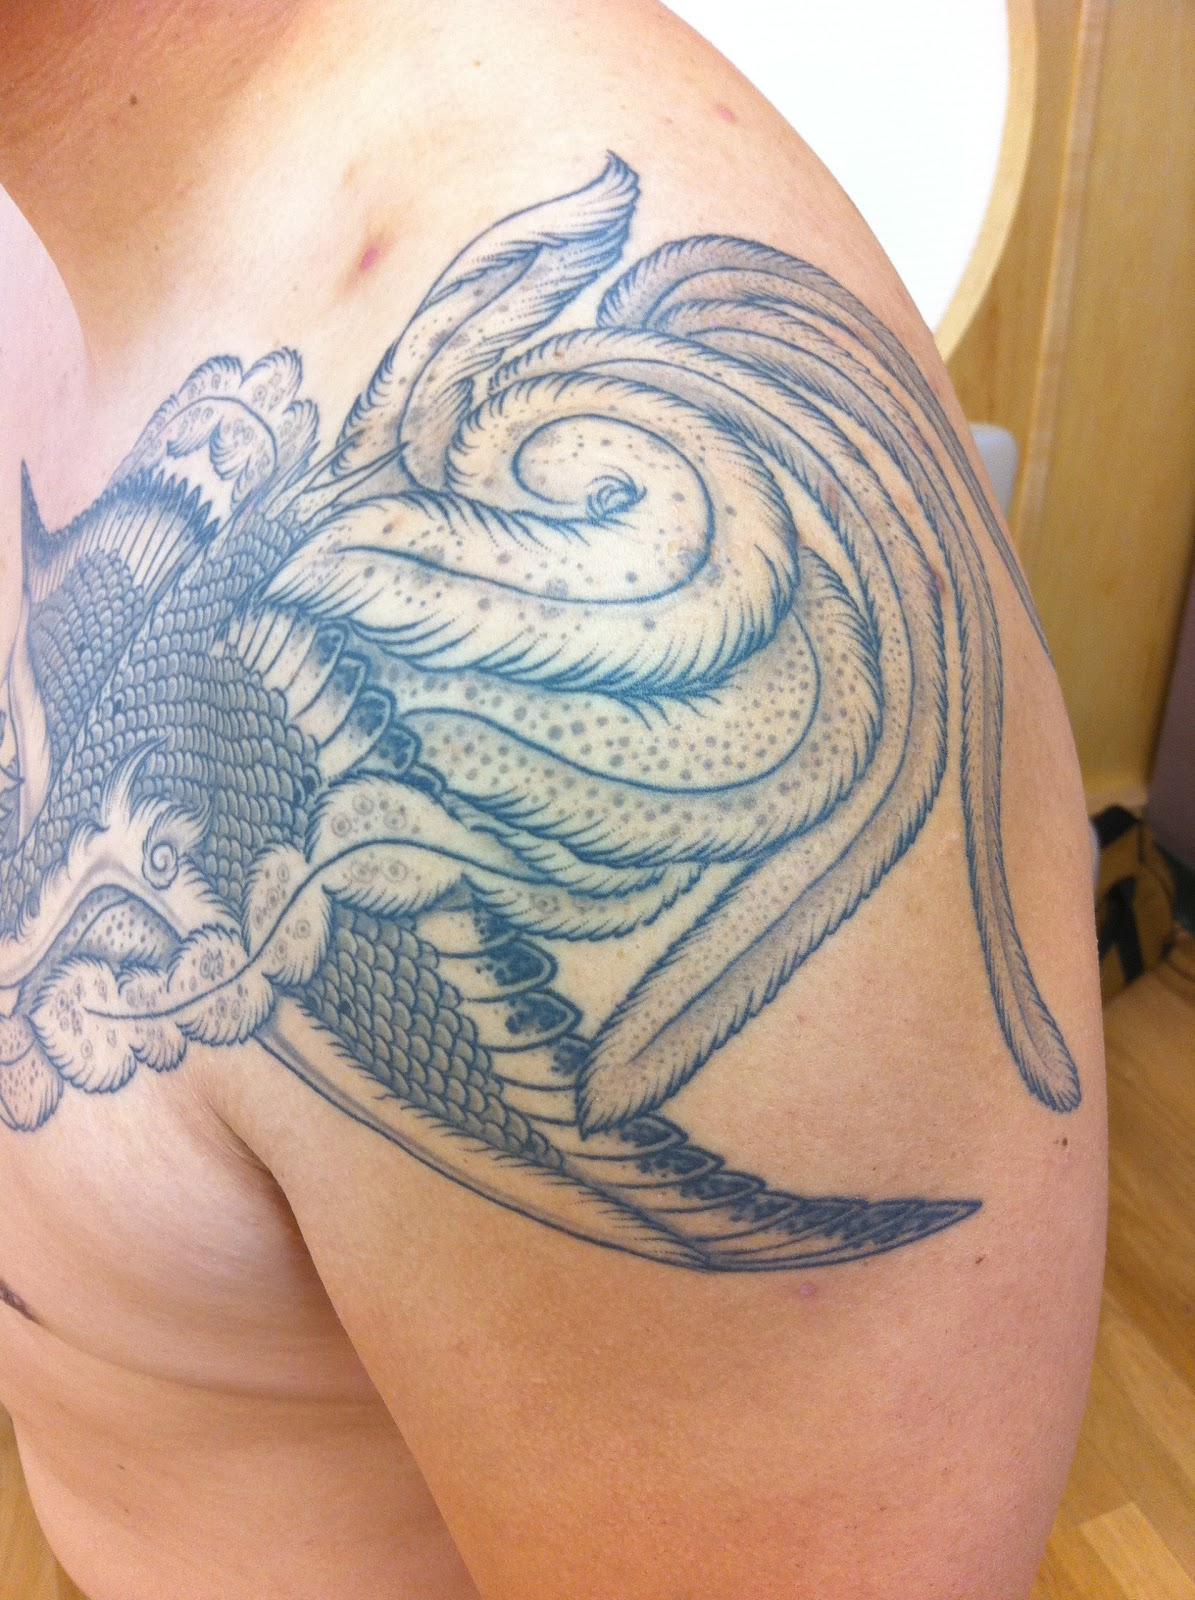 Born to tattoo ho o birdman birdwoman for Birdman 5 star tattoo